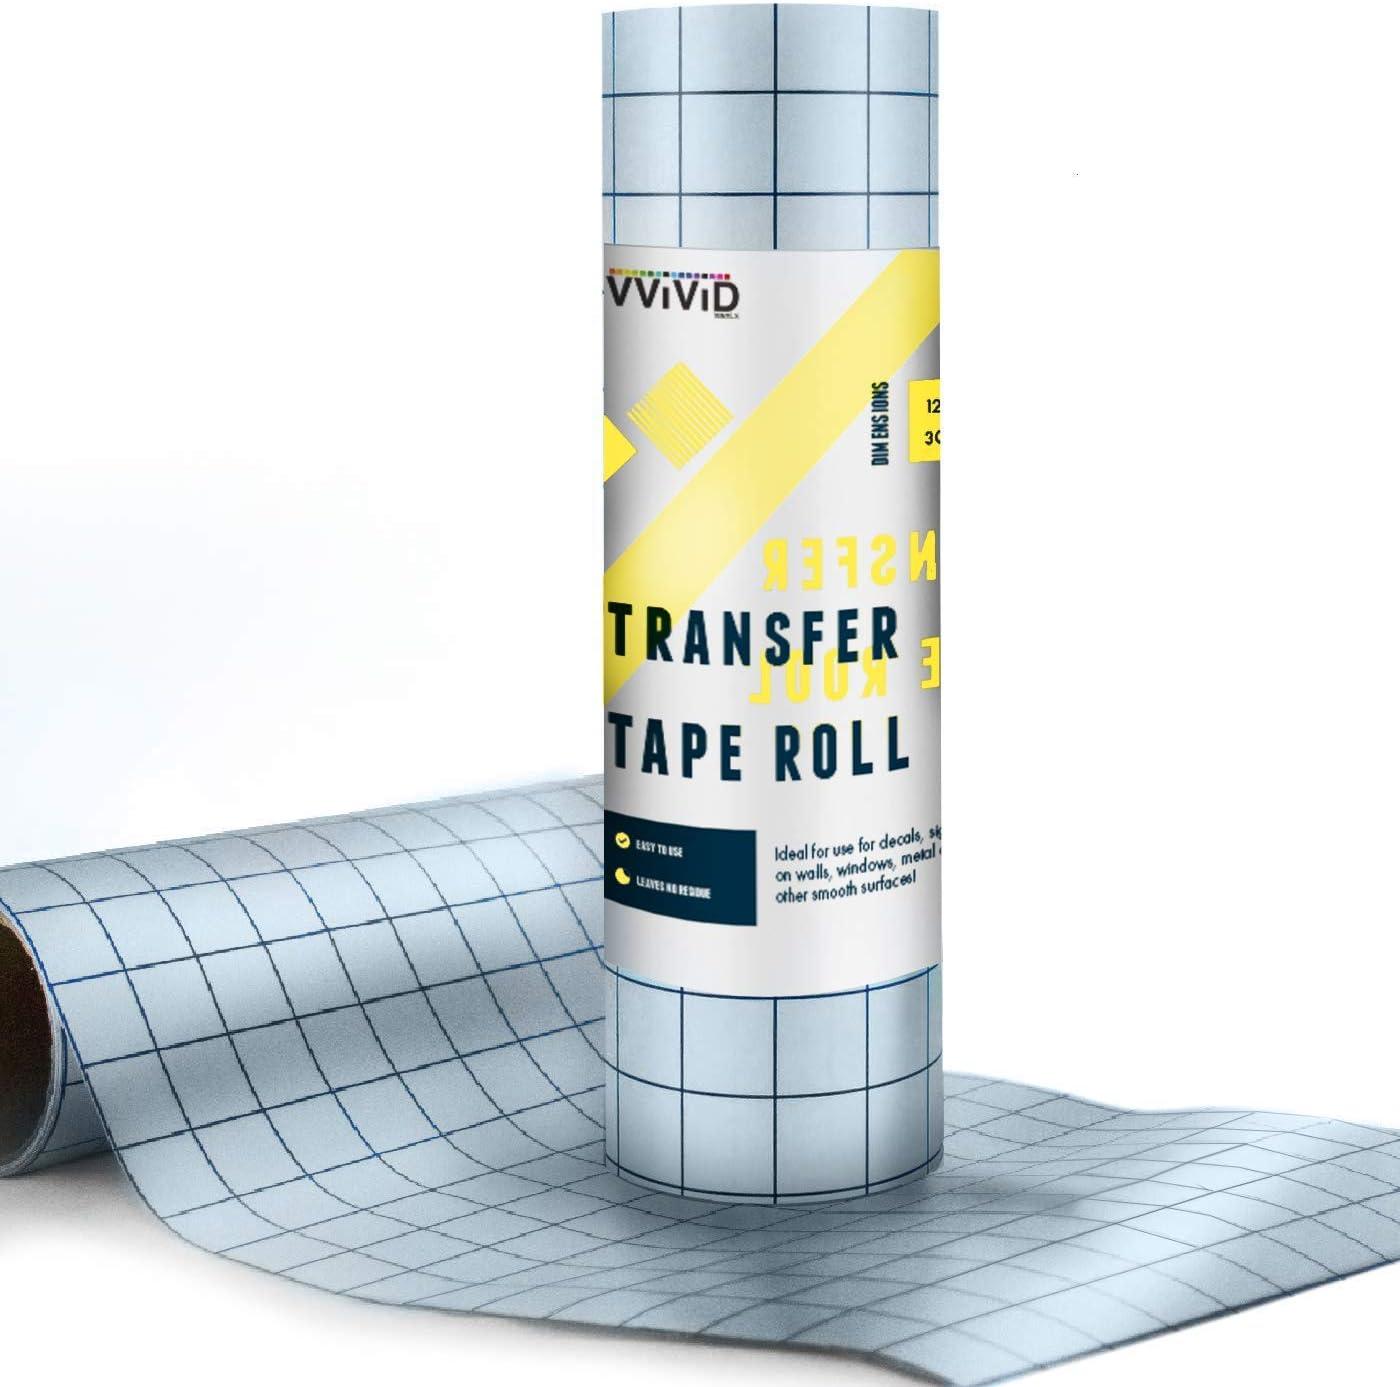 VViViD Transparent Medium Tack Vinyl Transfer Roll w//Grid for Signage 7ft x 12in Crafts /& Decals